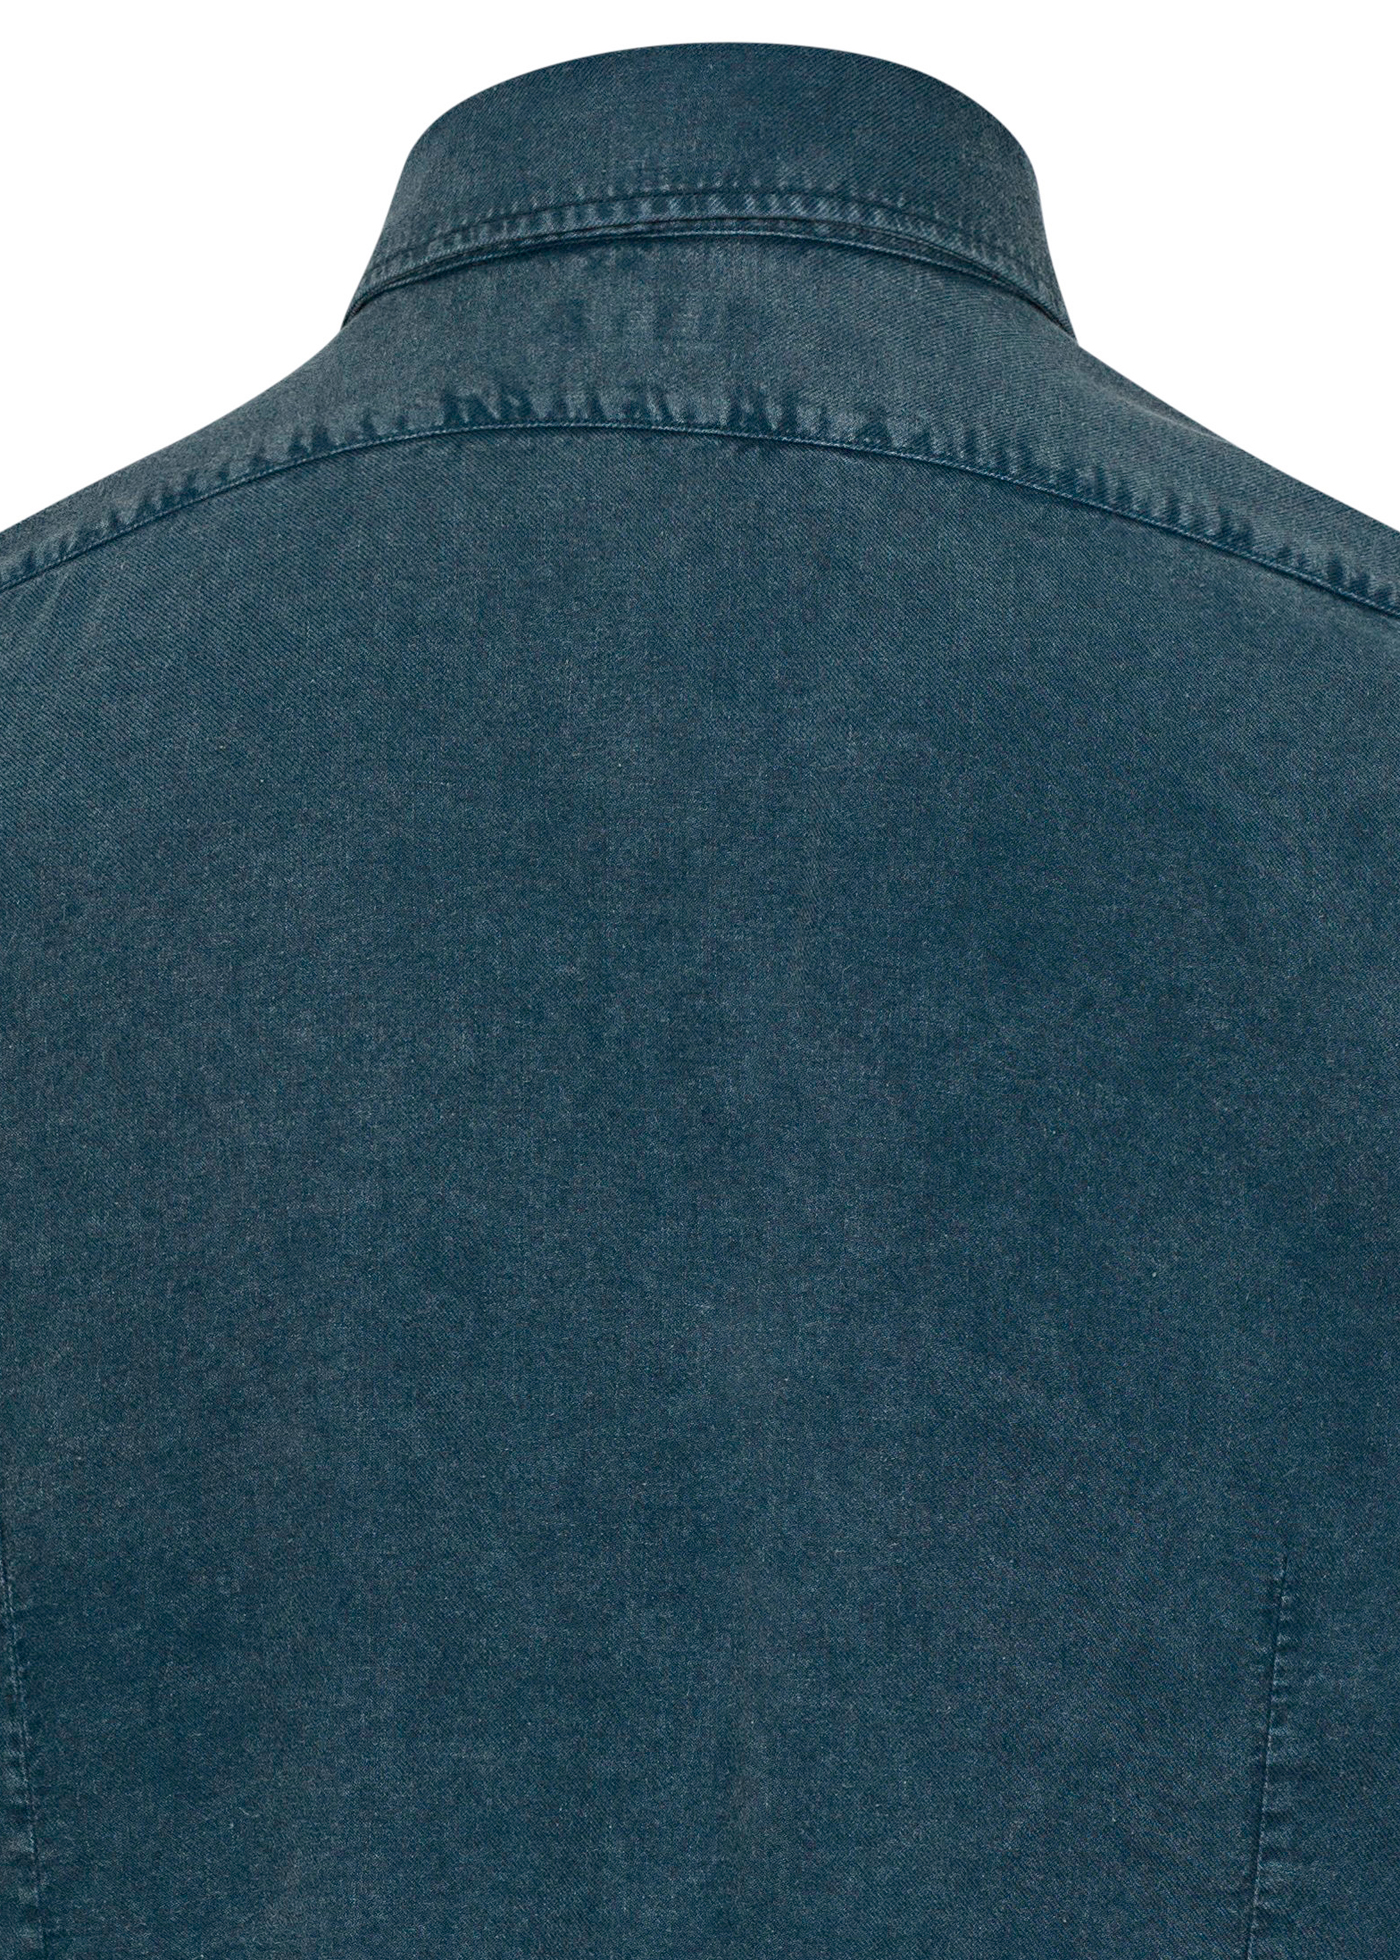 Shawl Collar Cardi image number 3